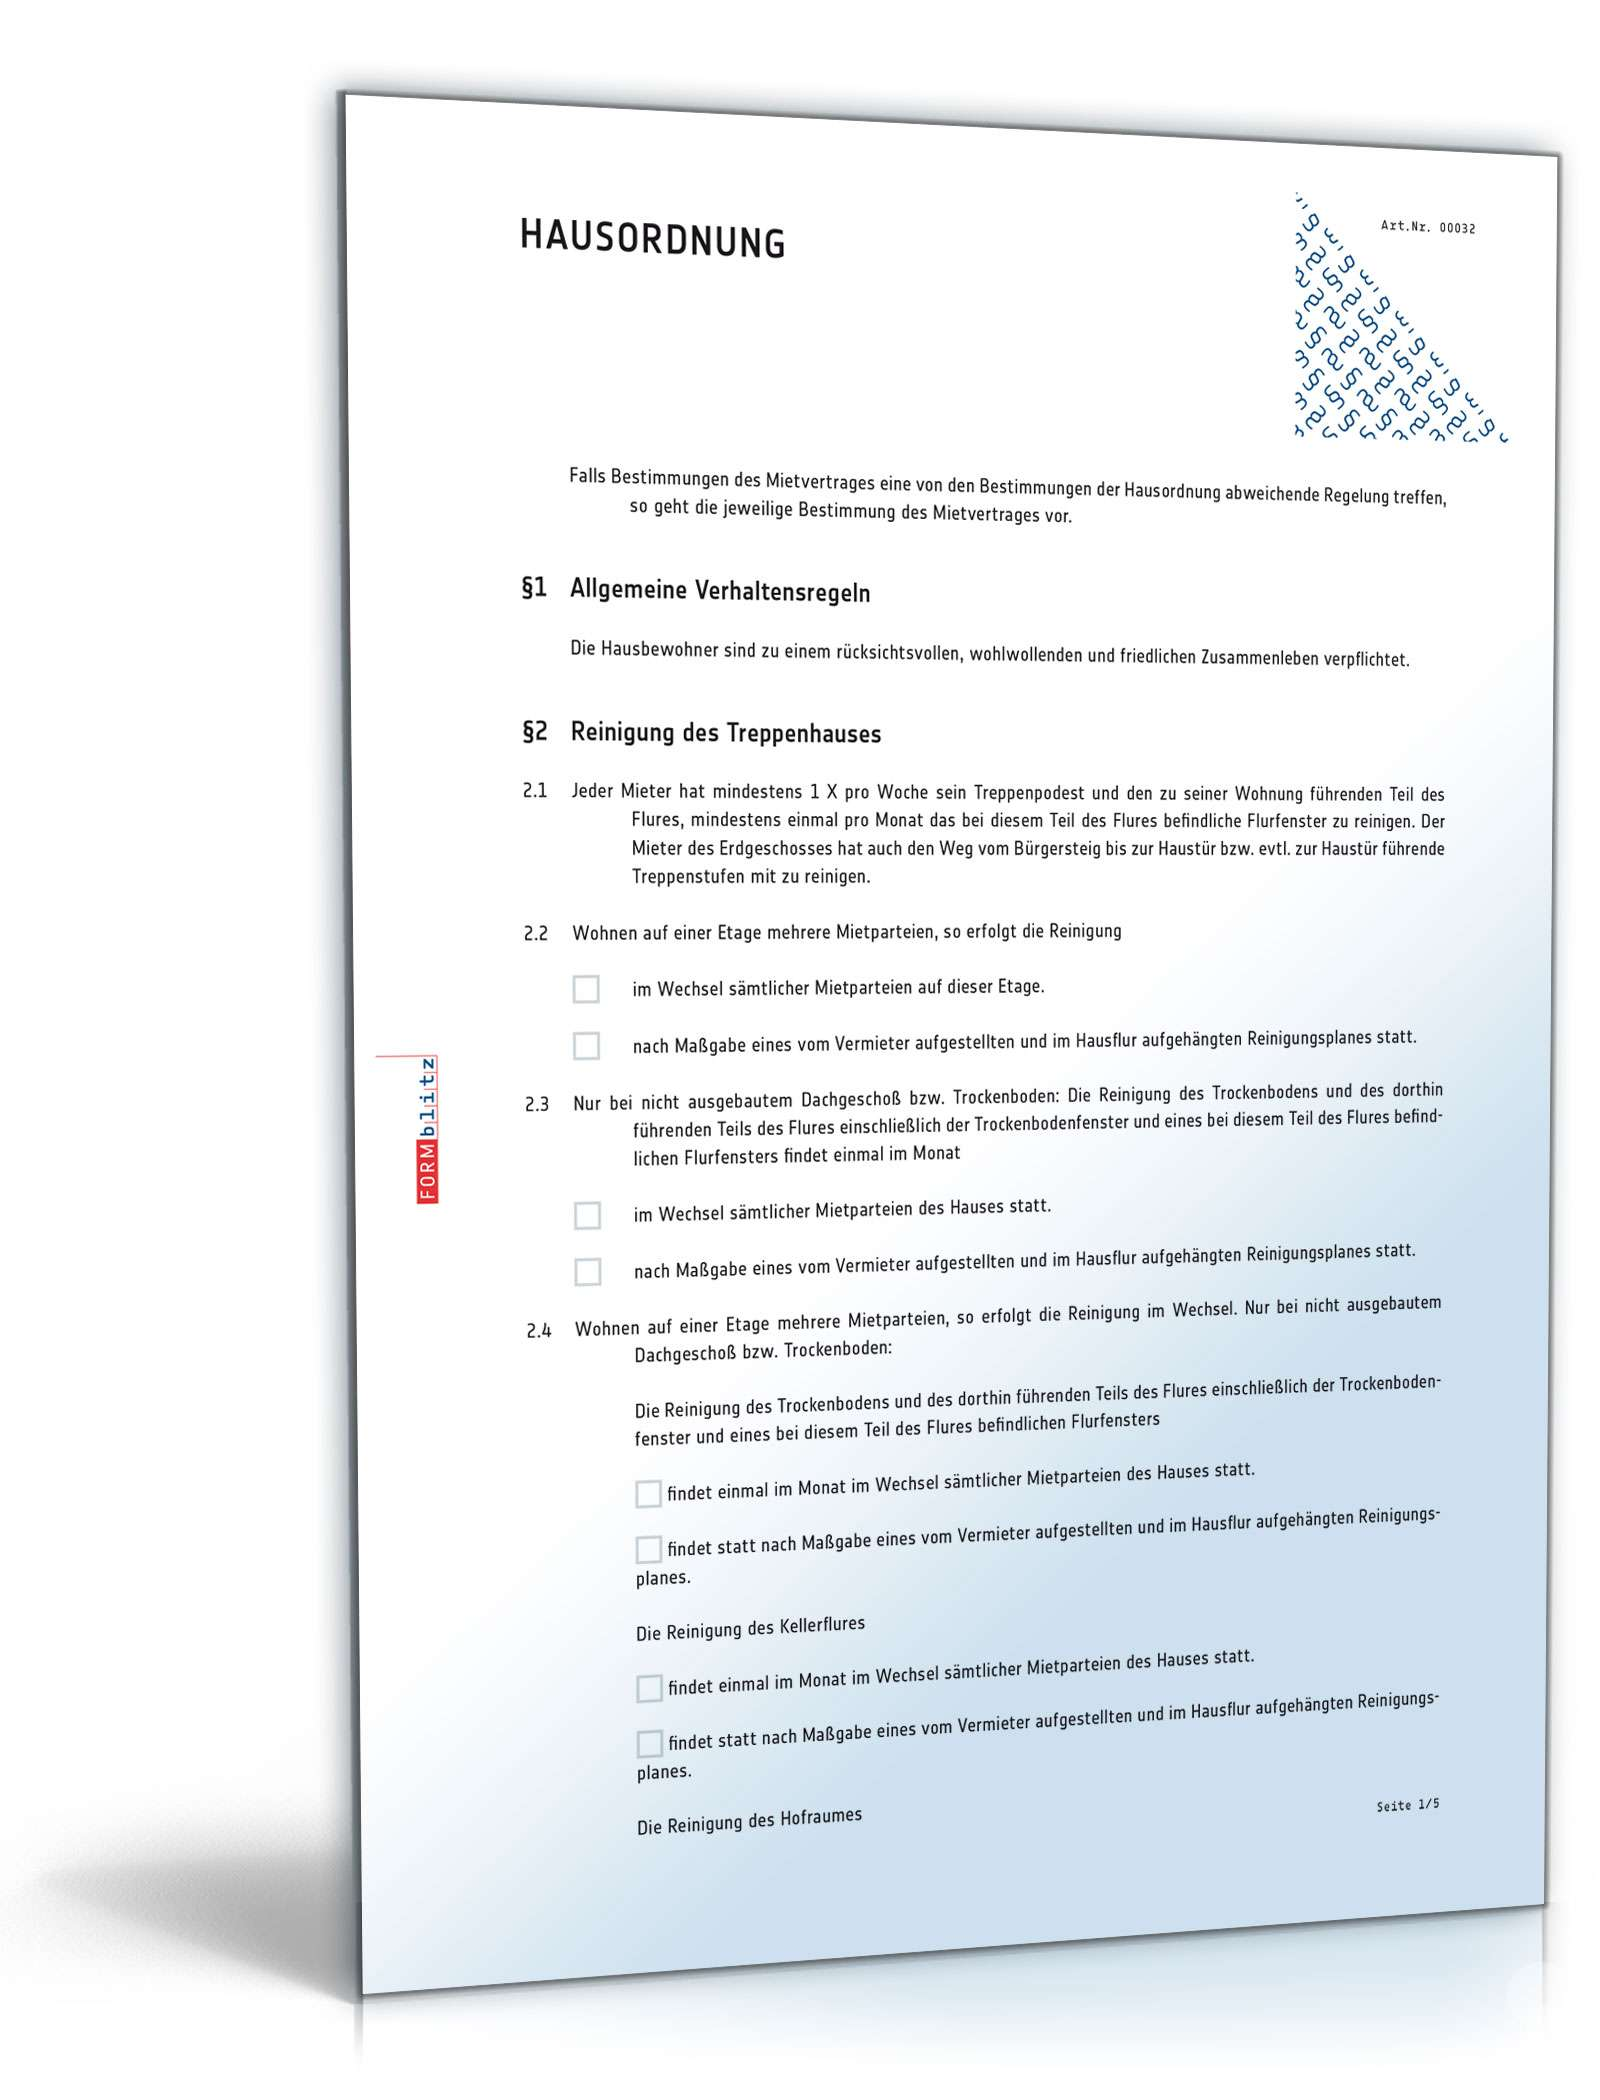 hausordnung muster vorlage zum download - Hausubergabeprotokoll Muster